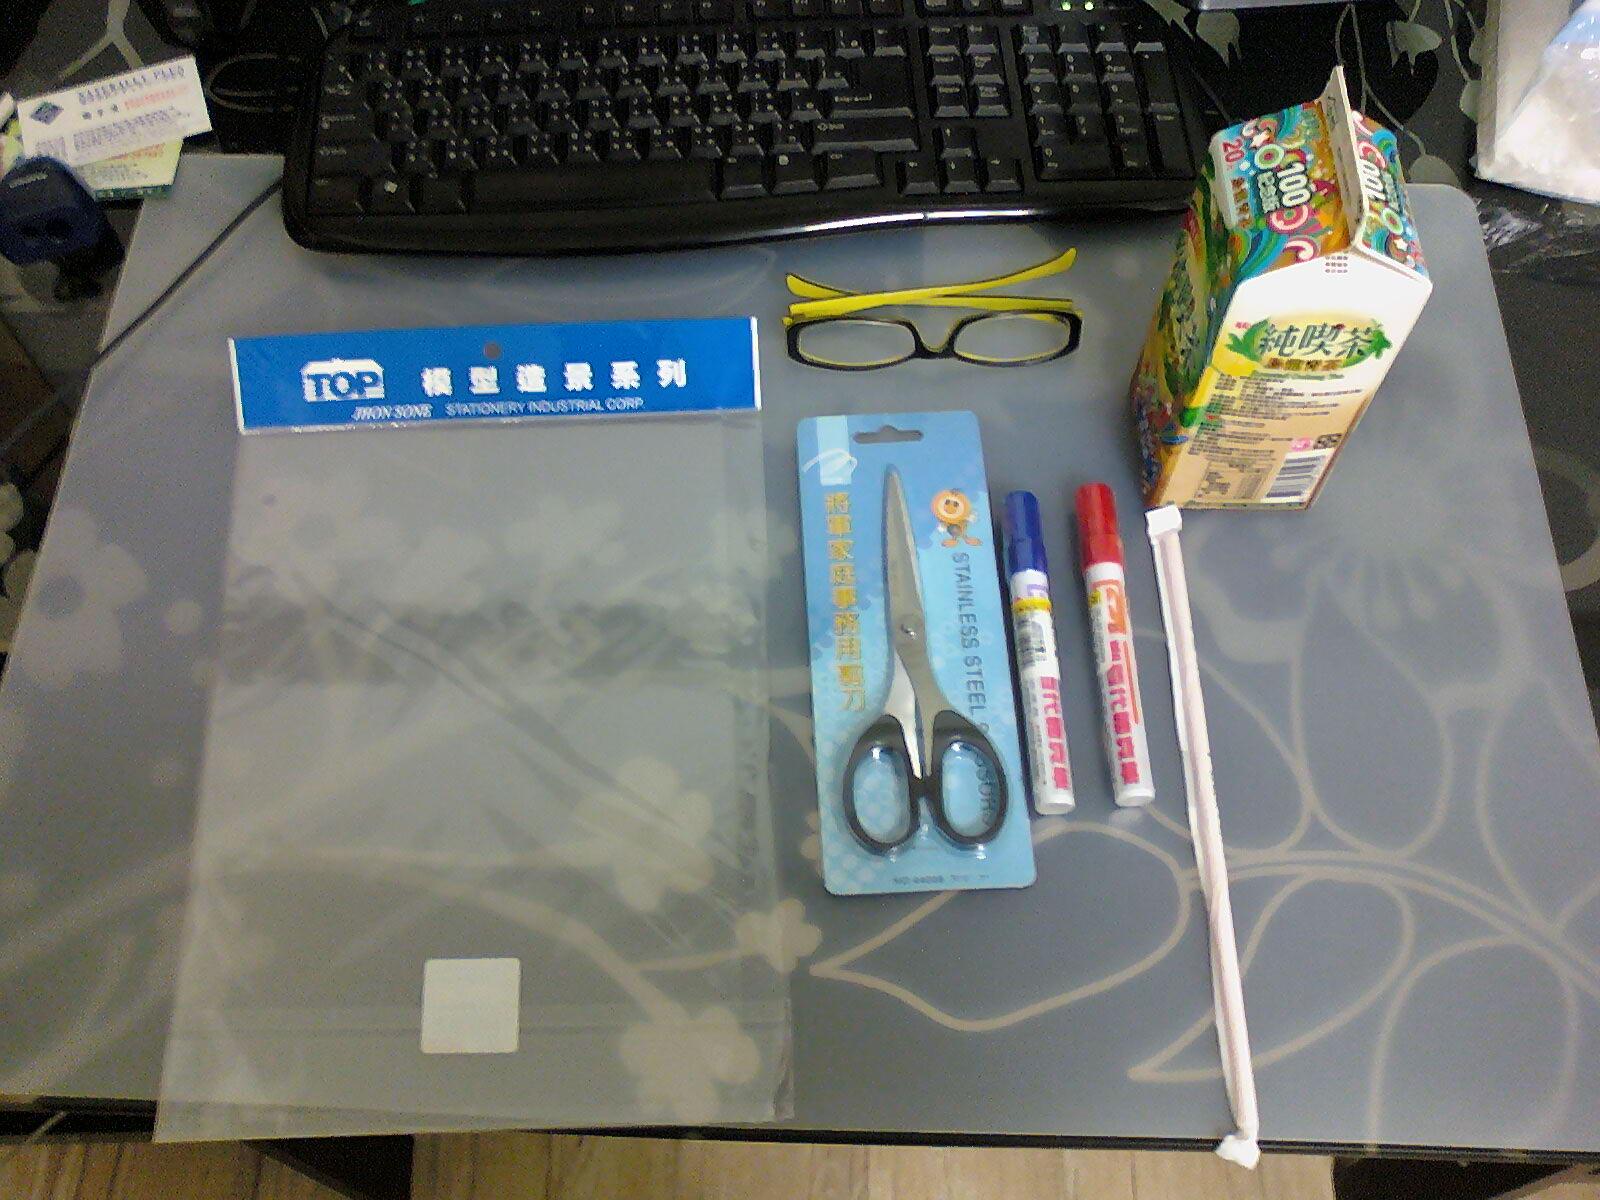 Zhi Jun Chien space: [製作] 3D超簡便立體眼鏡製作